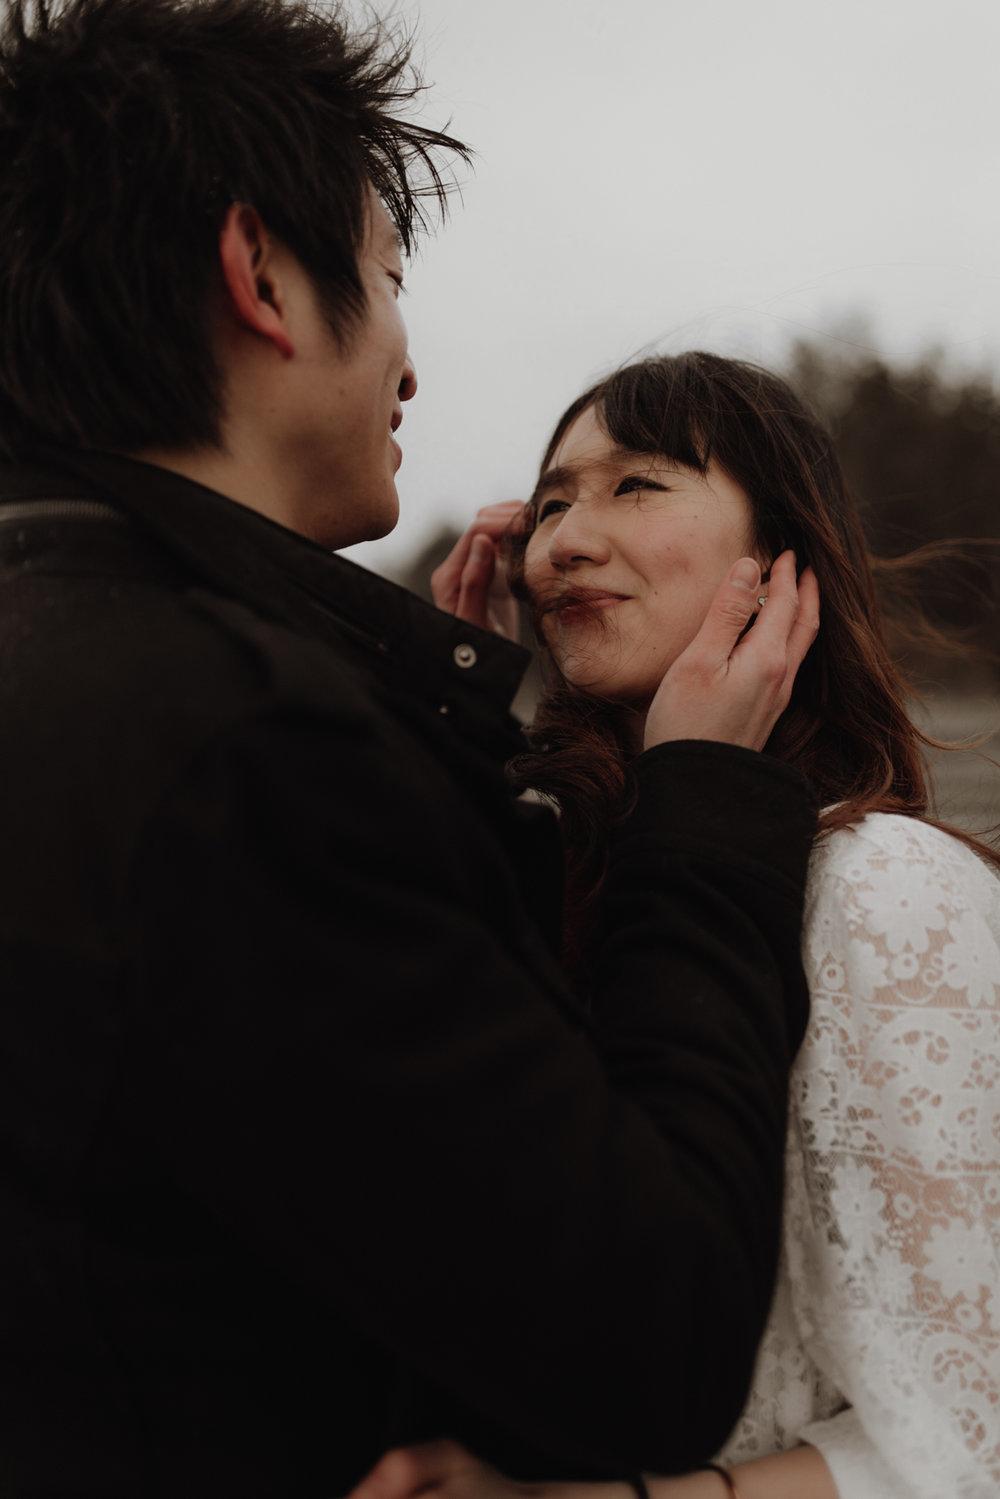 seattle-wedding-photographer-kerouac-0203.jpg